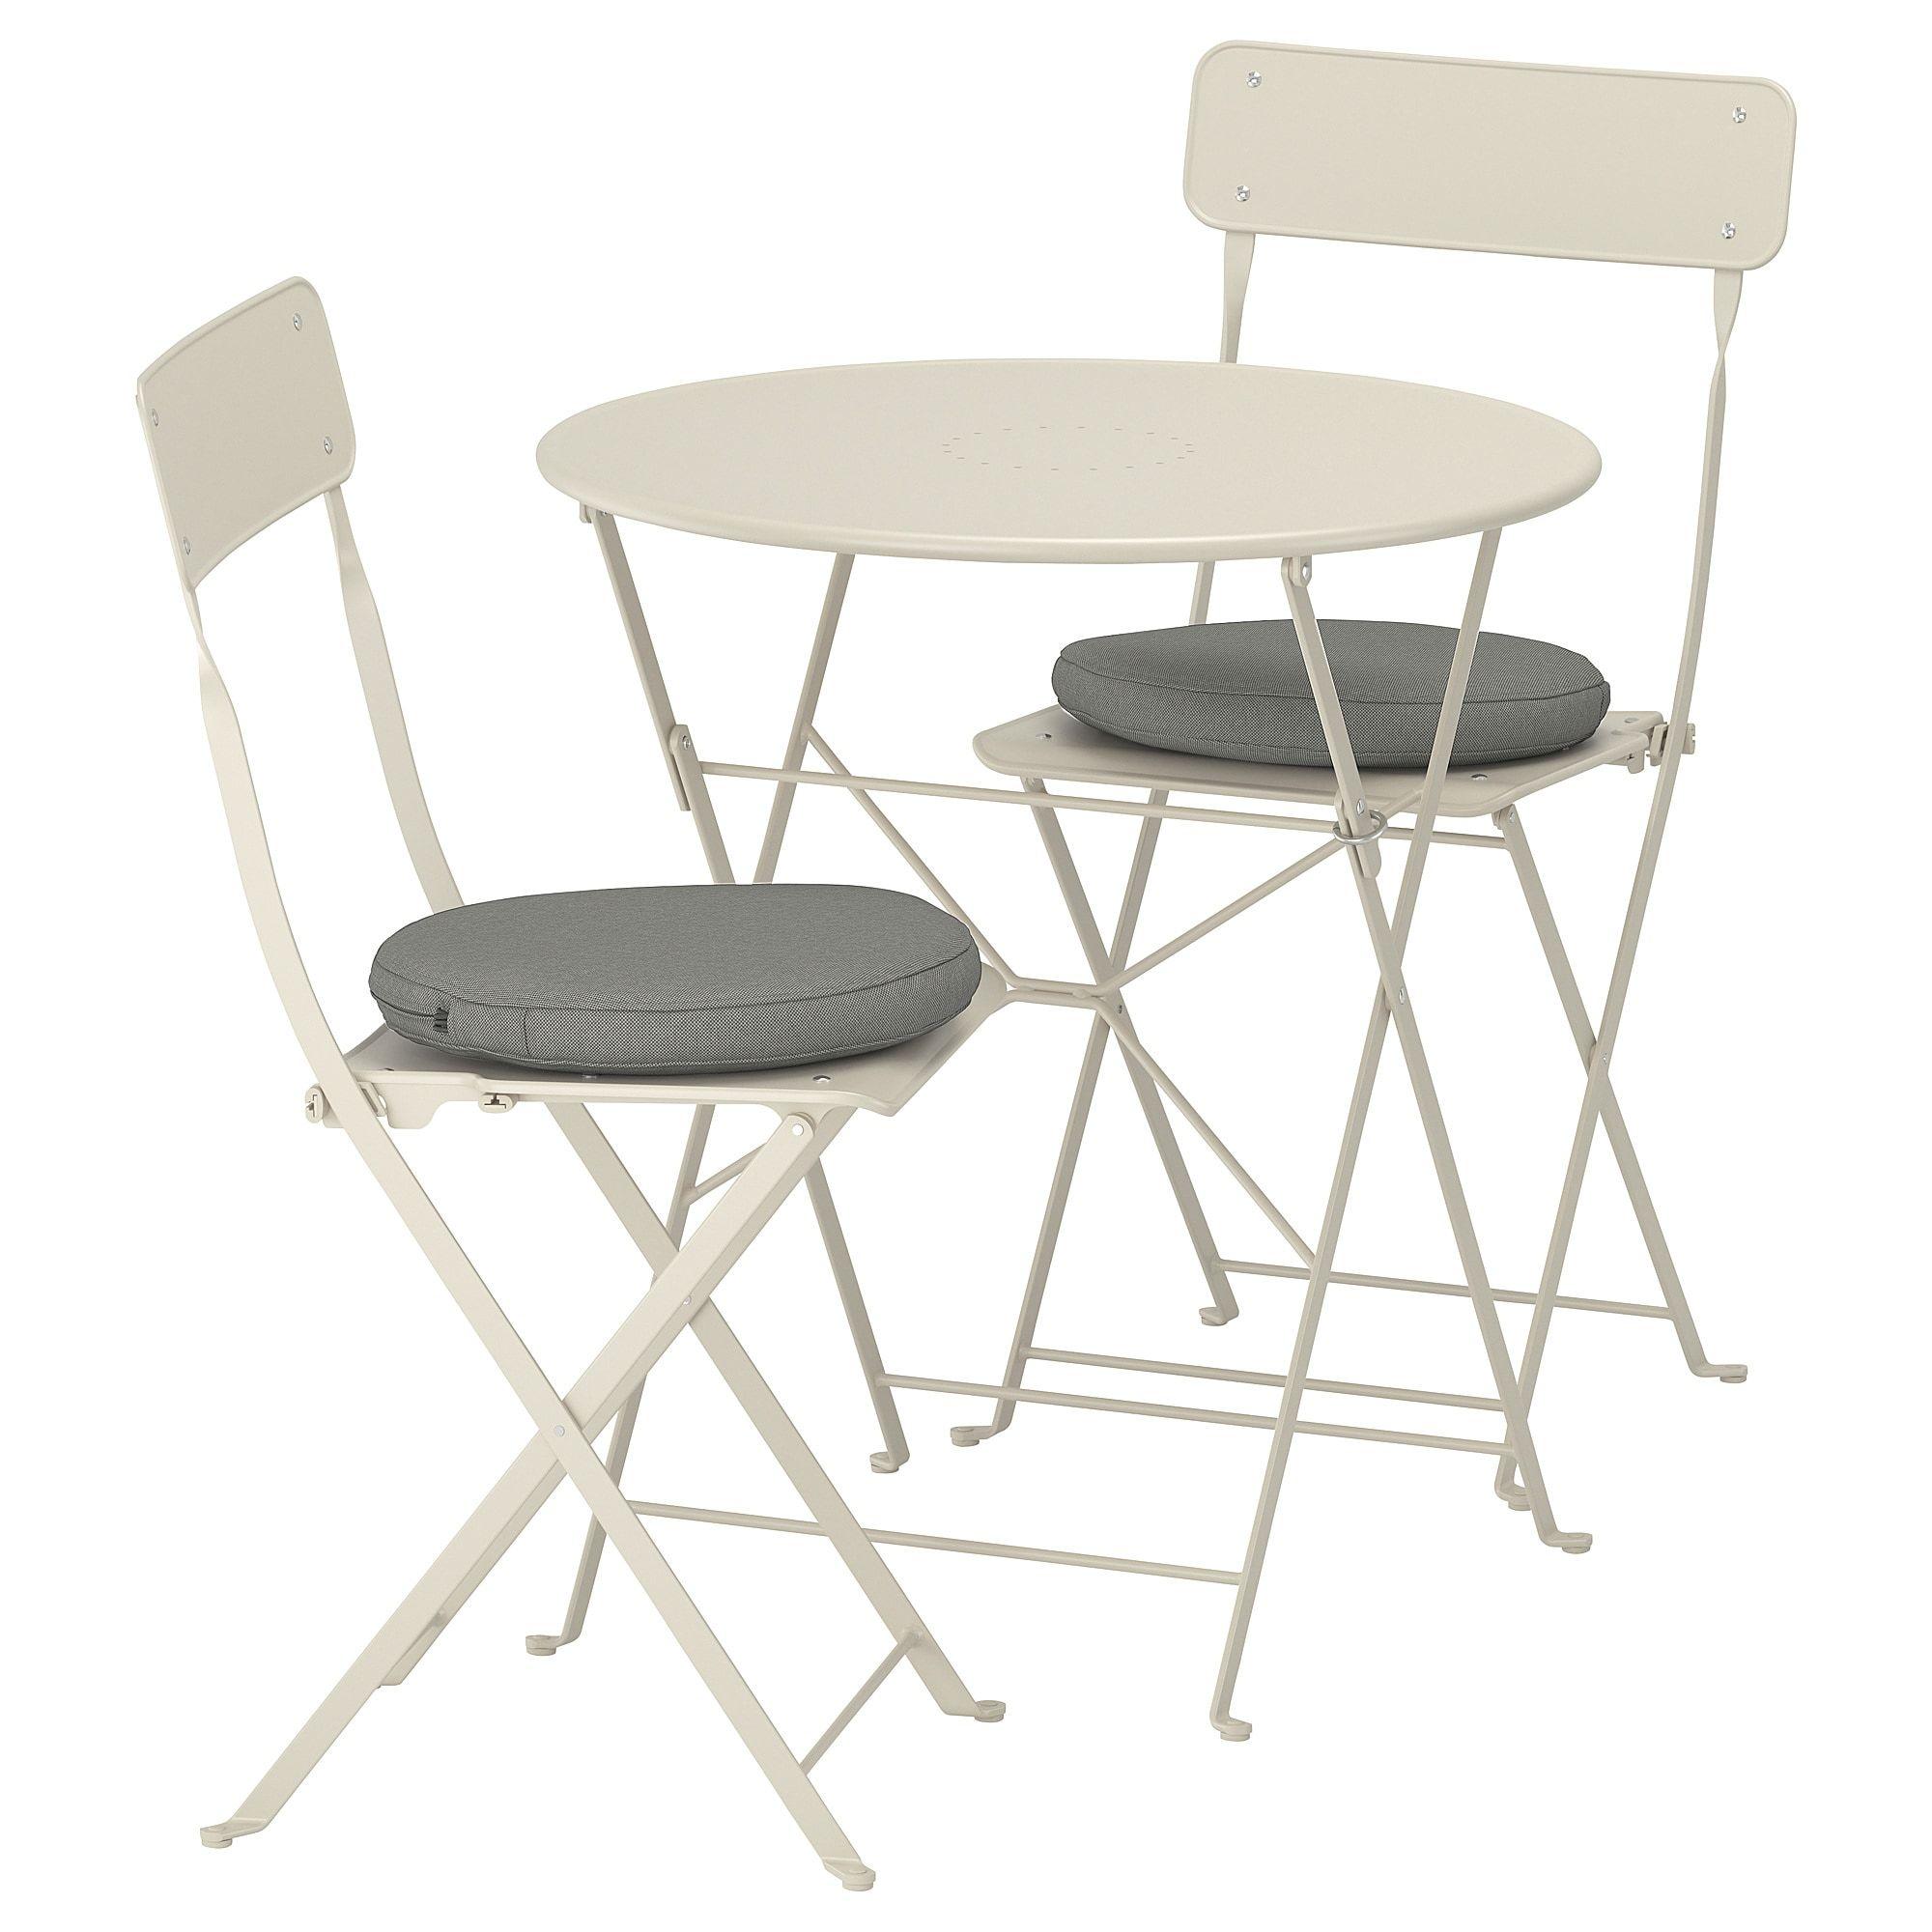 Sedie Pieghevoli Imbottite Ikea.Saltholmen Tavolo 2 Sedie Pieghevoli Giardino Beige Kuddarna